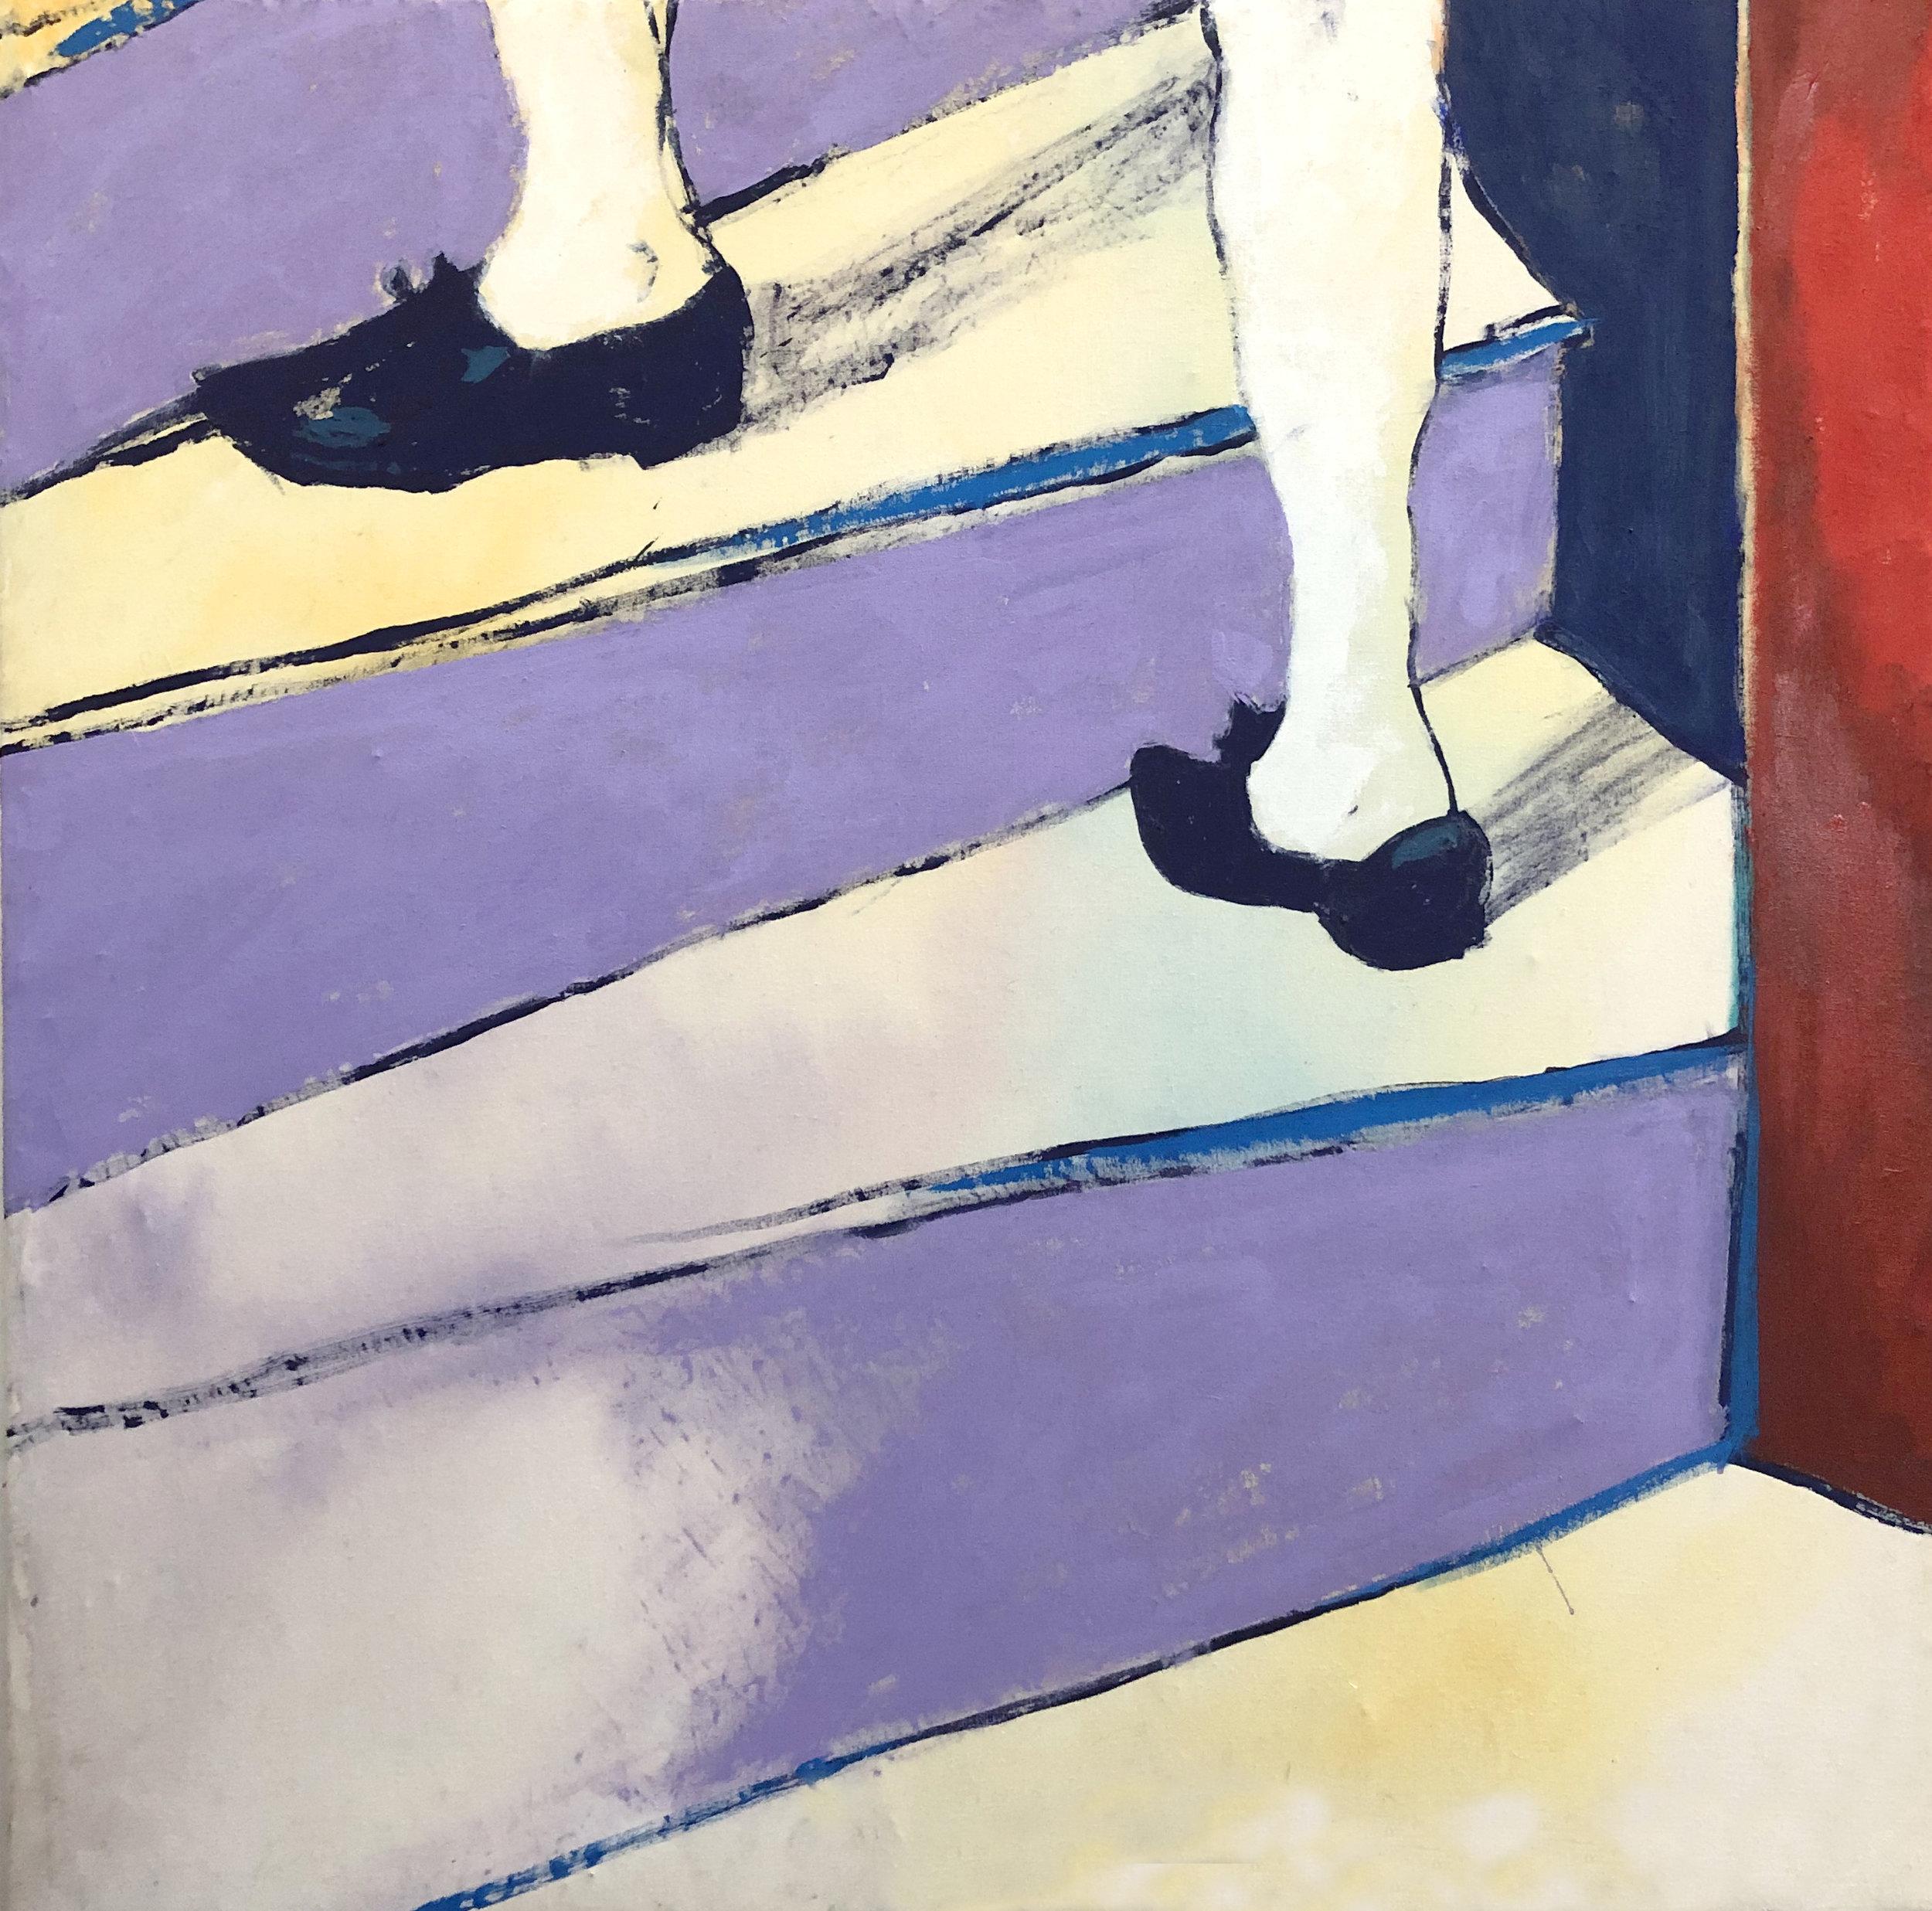 03_Joshua Petker, 30x30%22, acrylic and oil on canvas, 2018.jpg